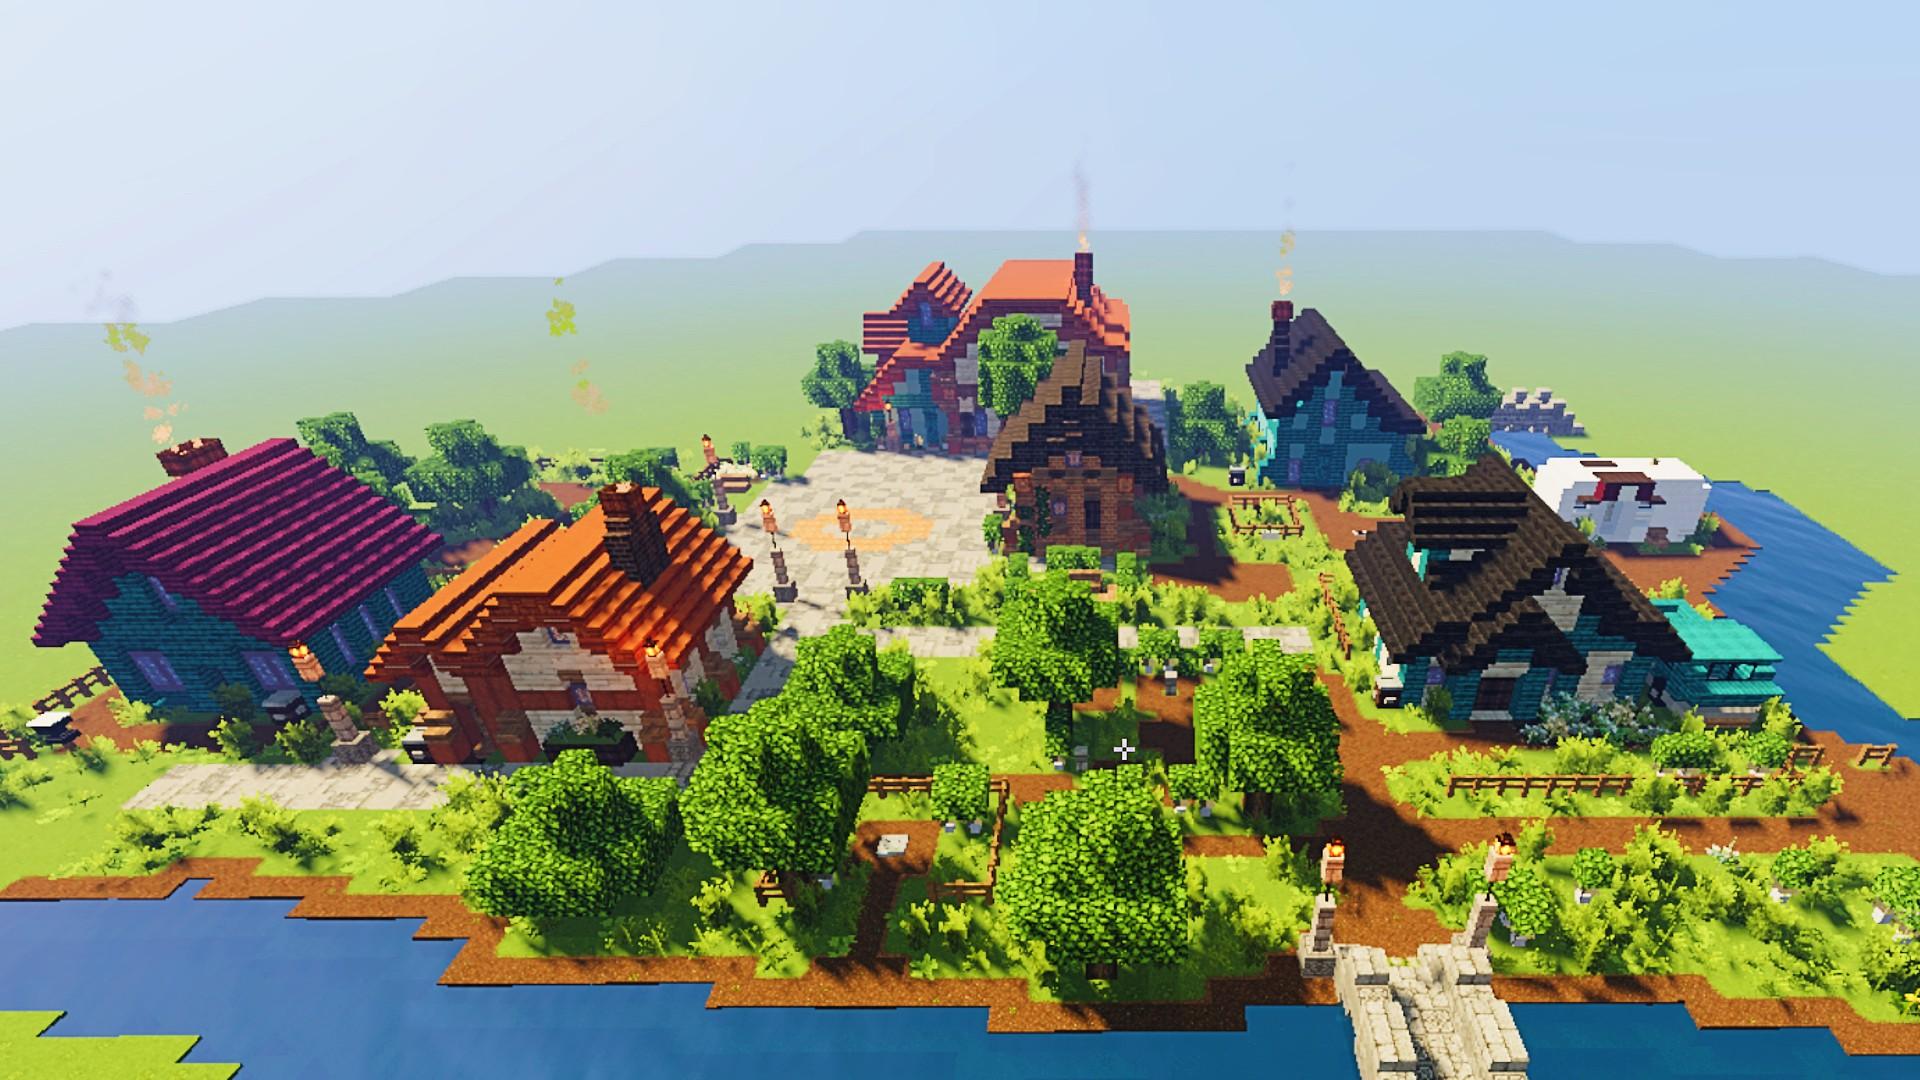 Minecraft player recreates Stardew Valley's town square in exquisite detail